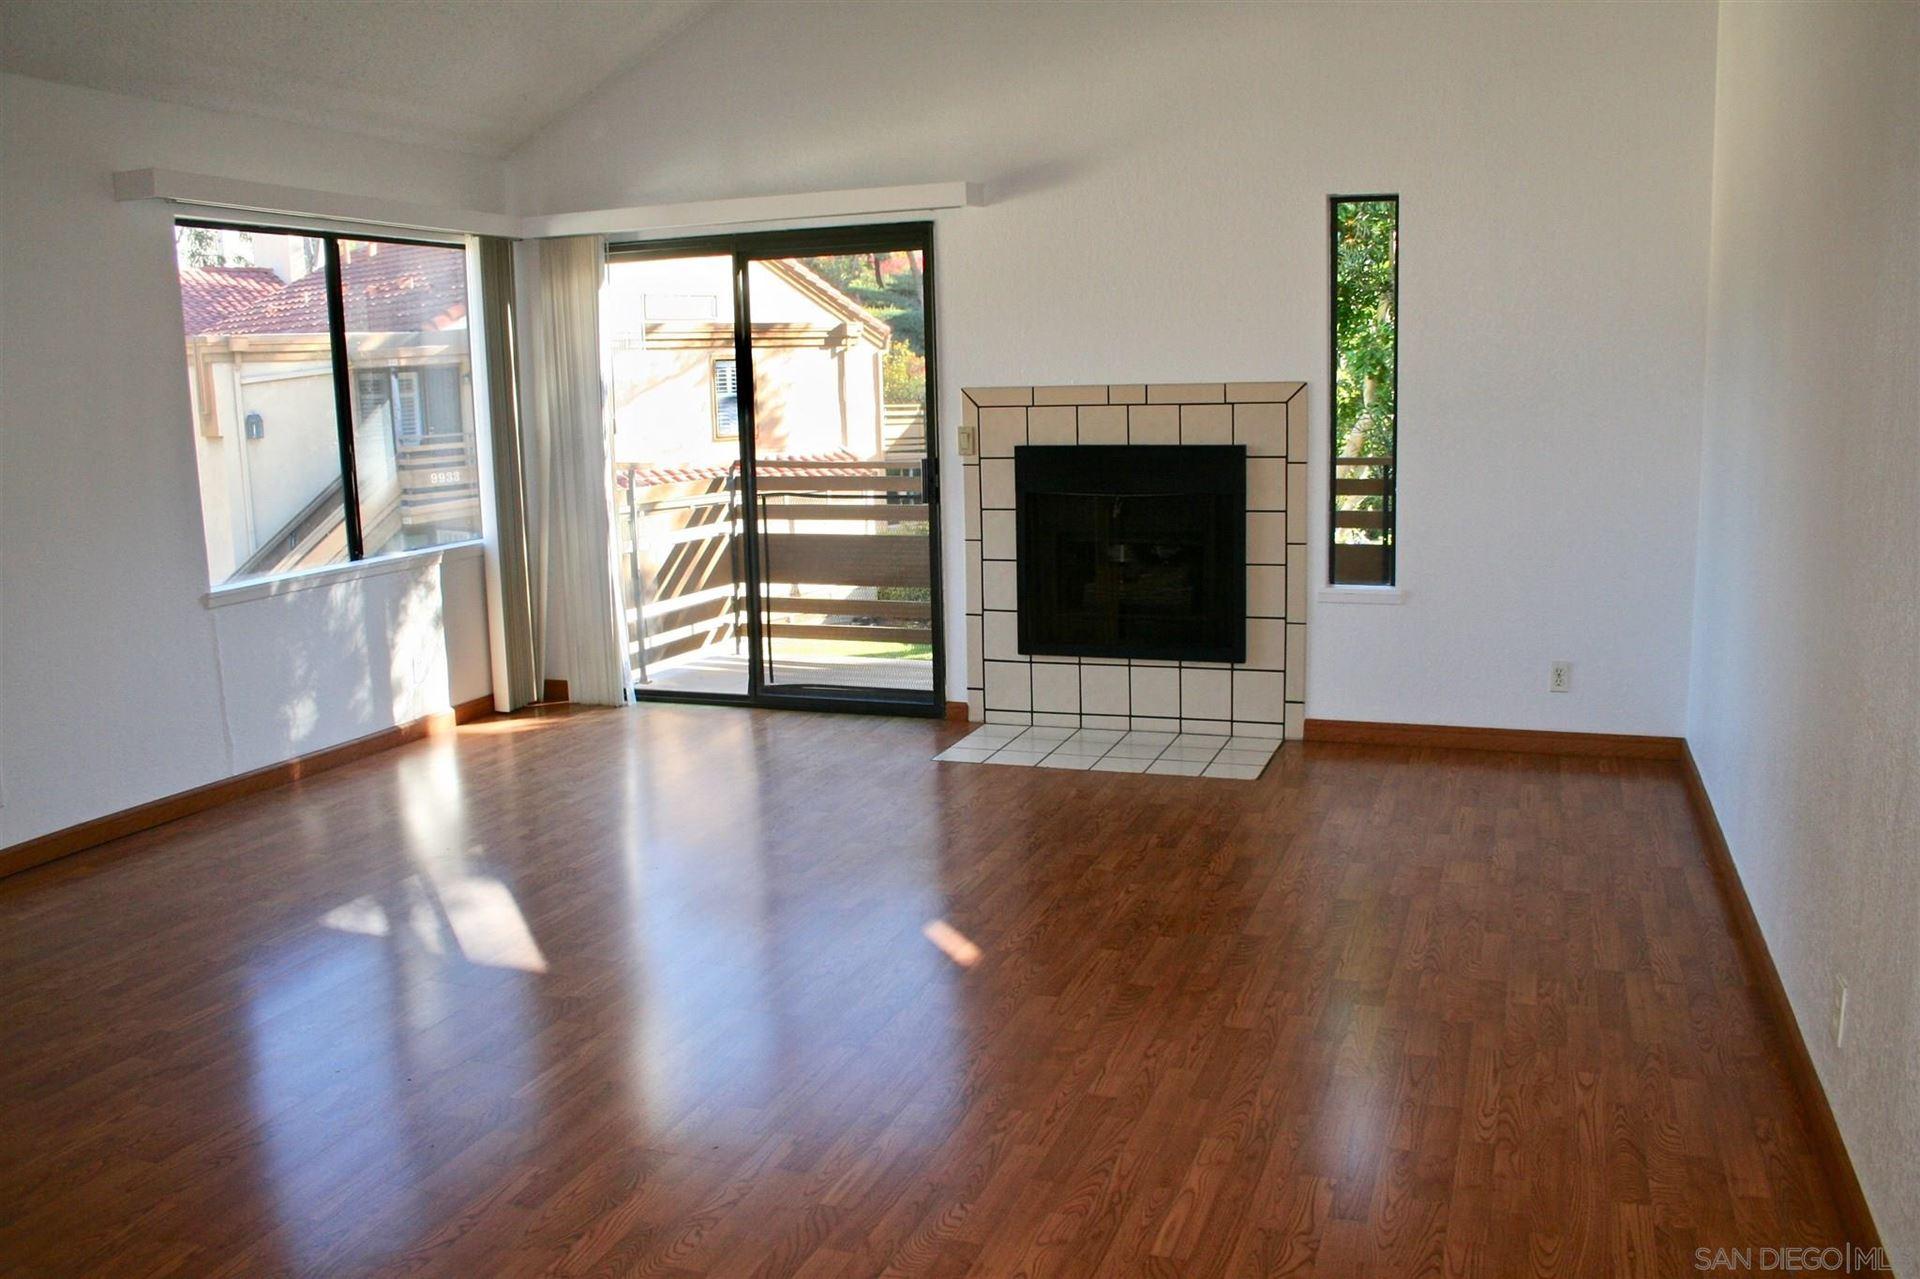 Photo of 9949 Scripps Westview Way #238, San Diego, CA 92131 (MLS # 210001118)